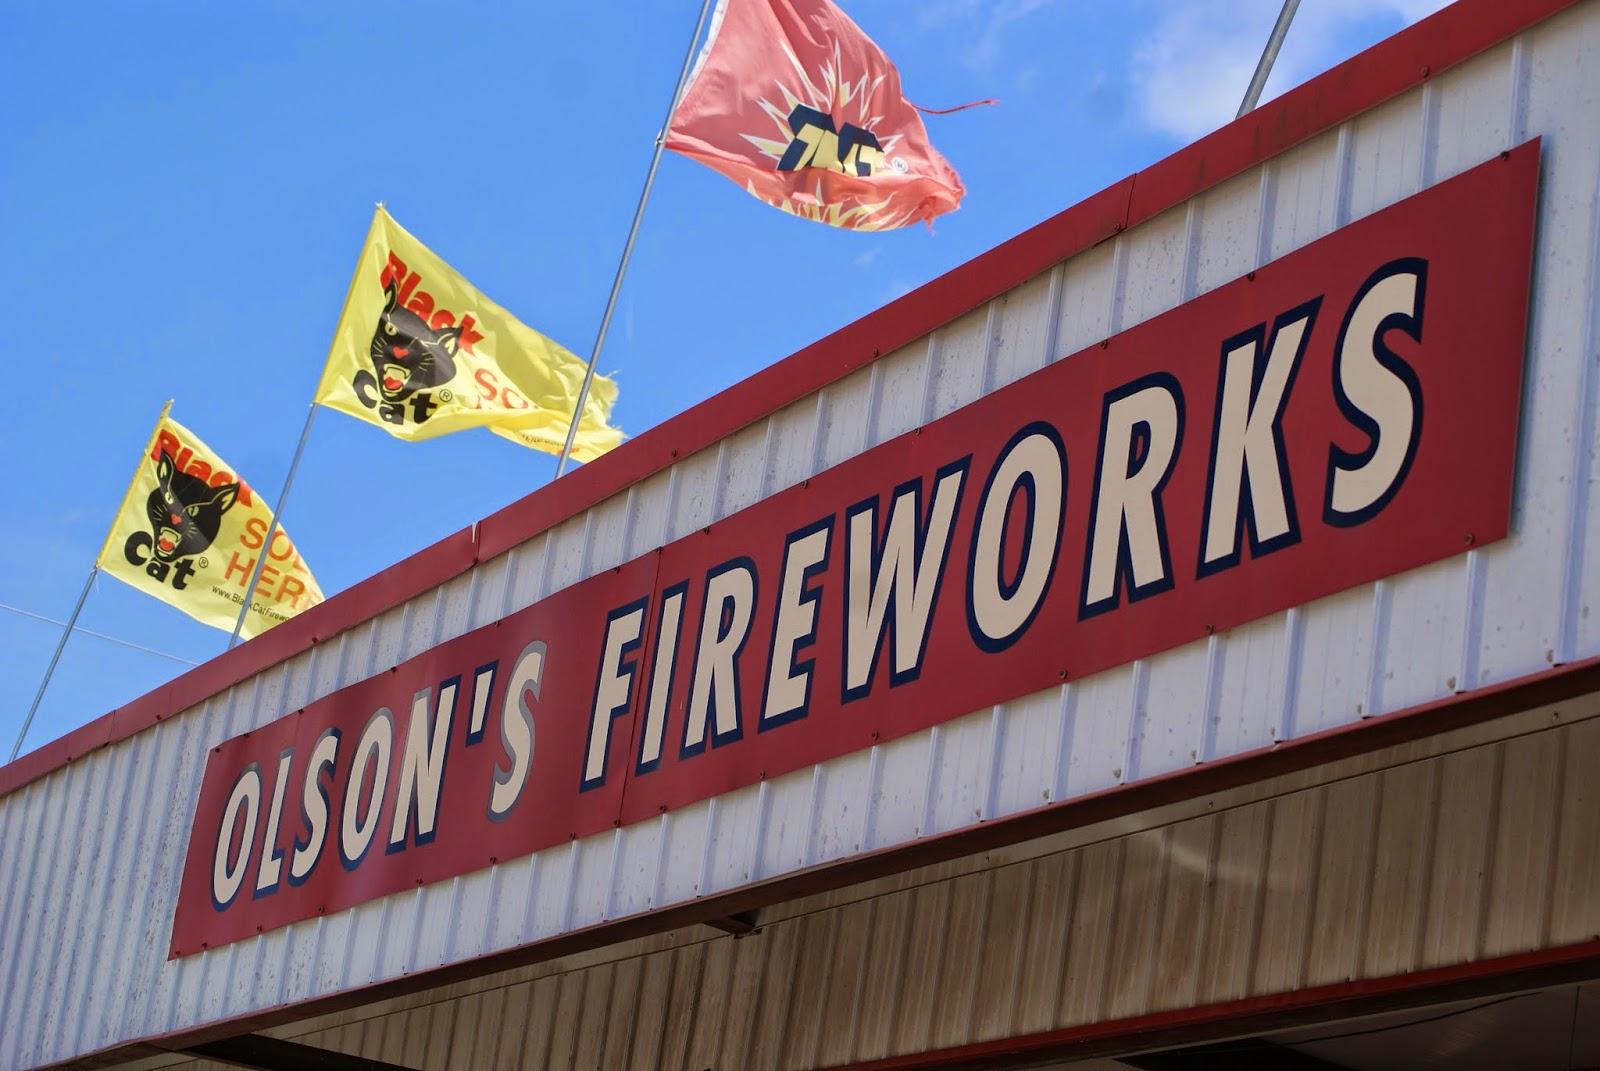 Olson's Fireworks Alexandria Louisiana